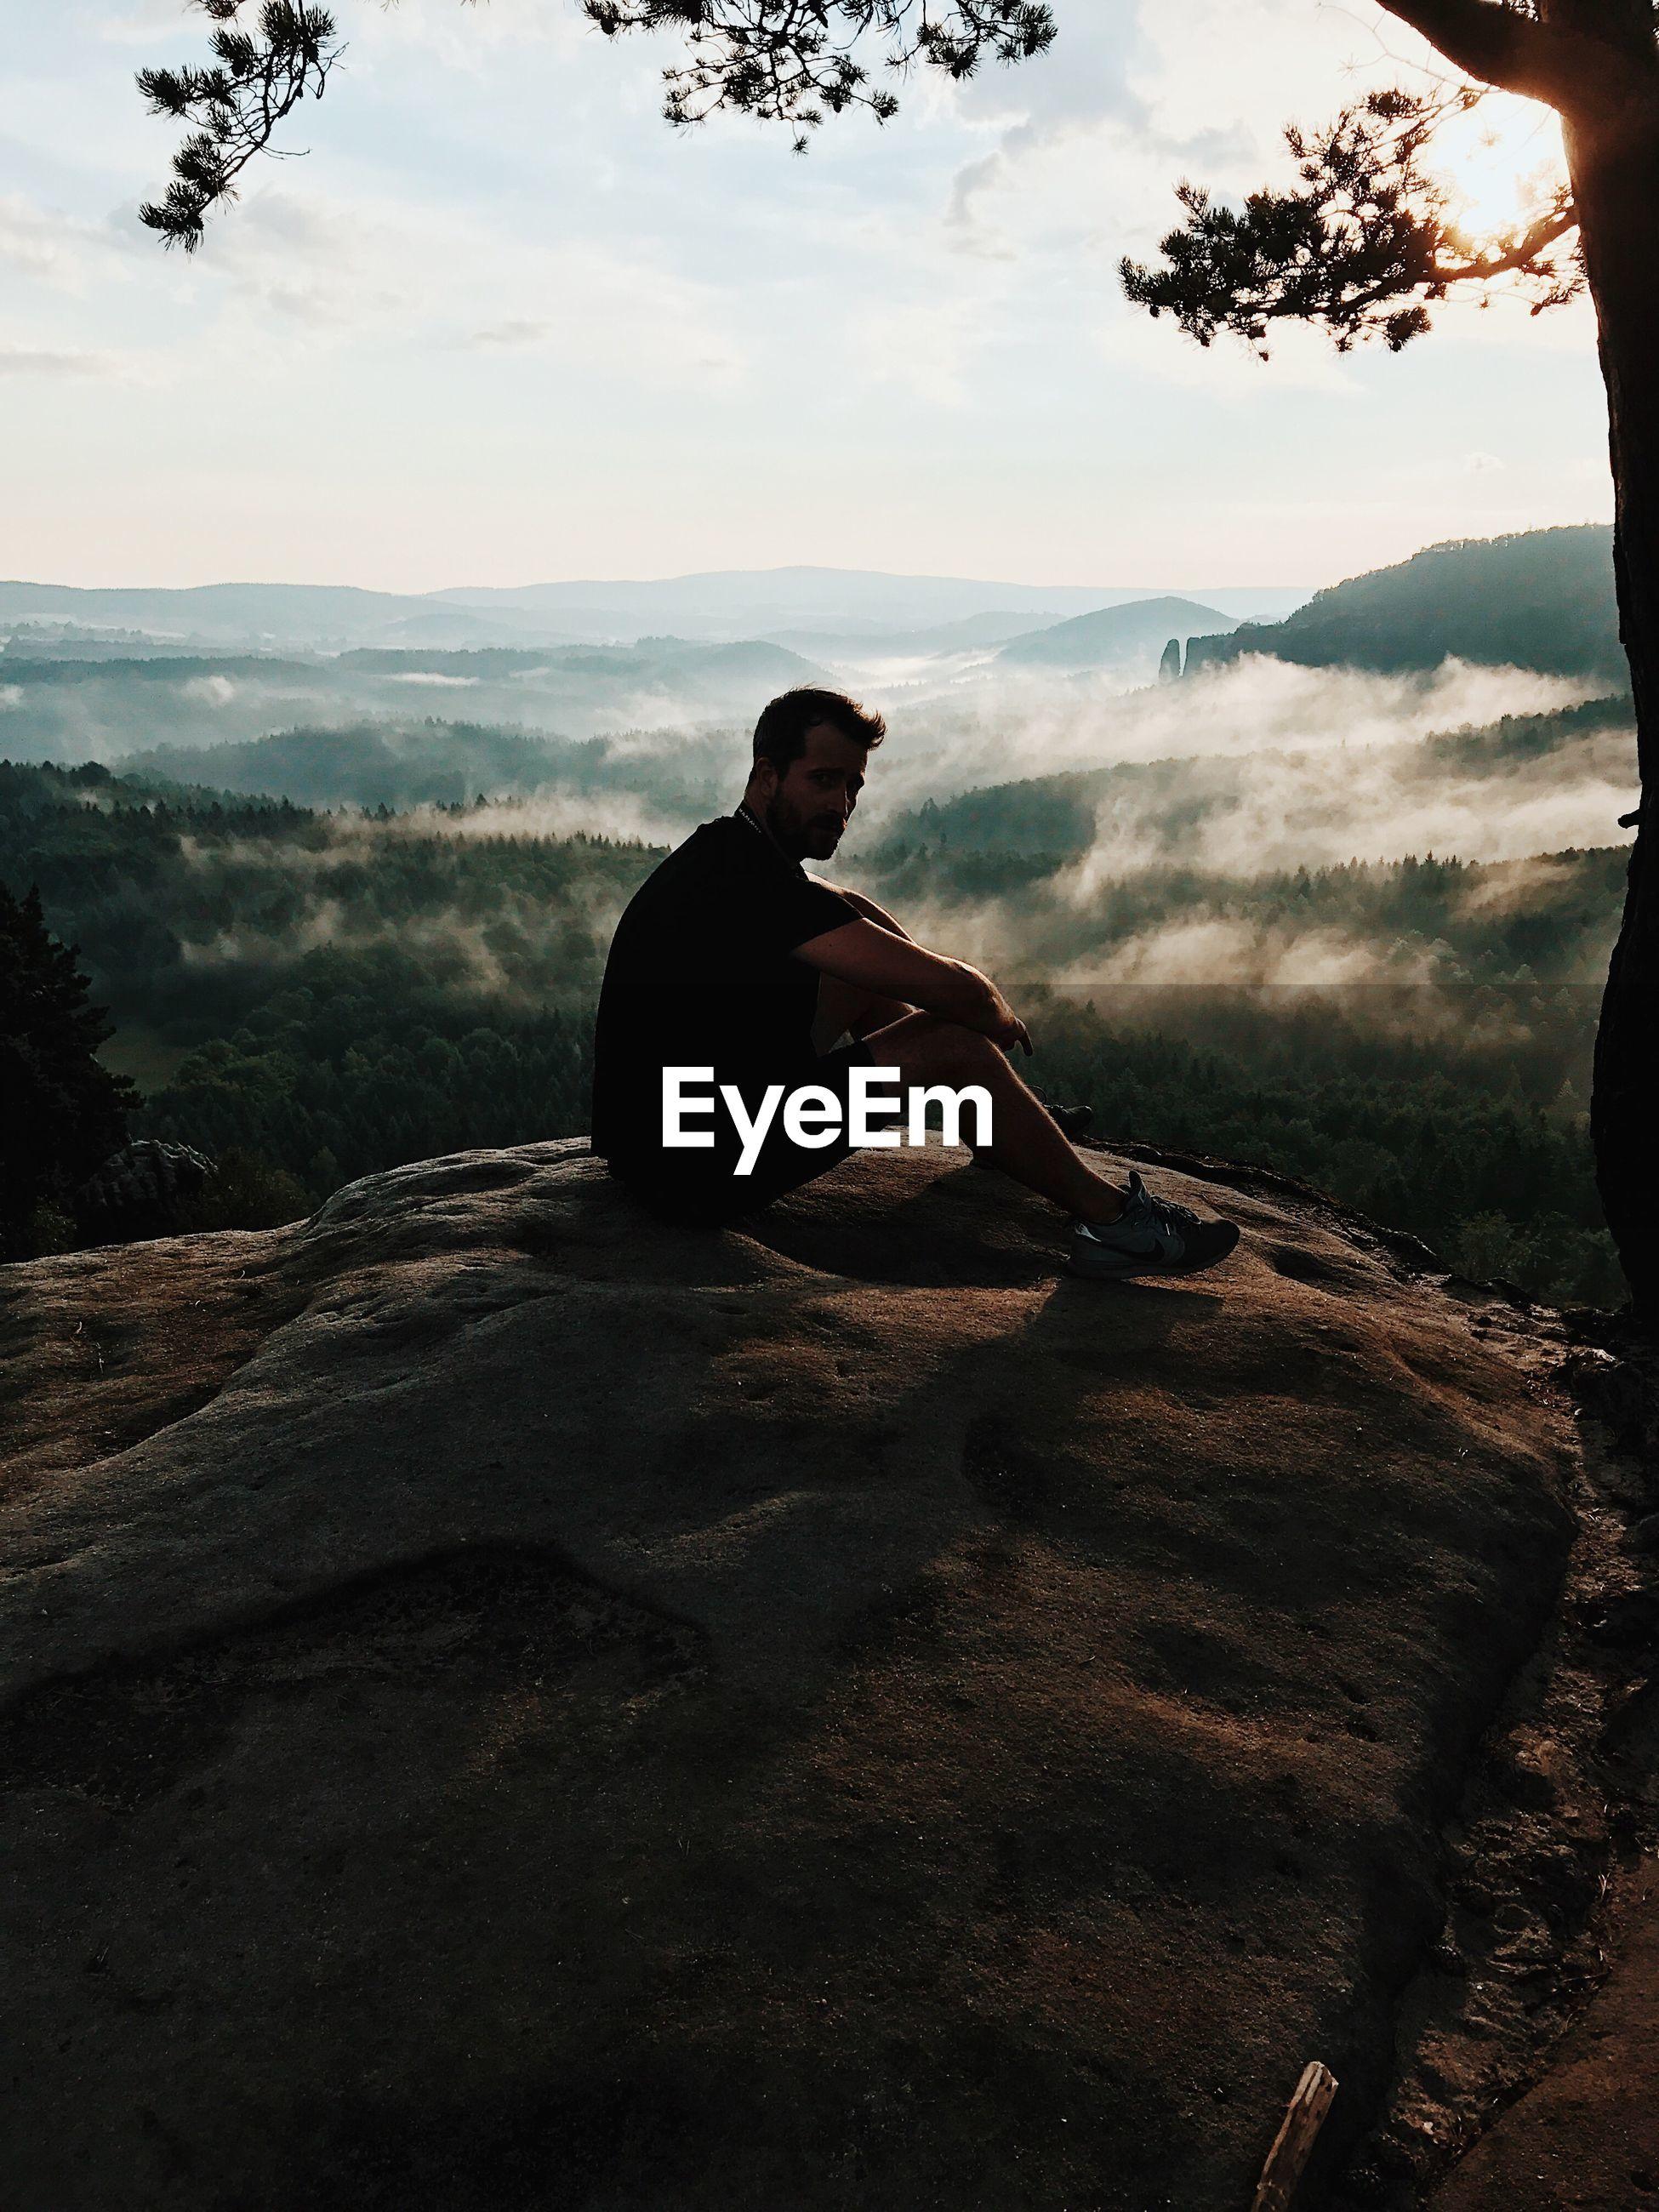 MAN SITTING ON LANDSCAPE AGAINST MOUNTAIN RANGE